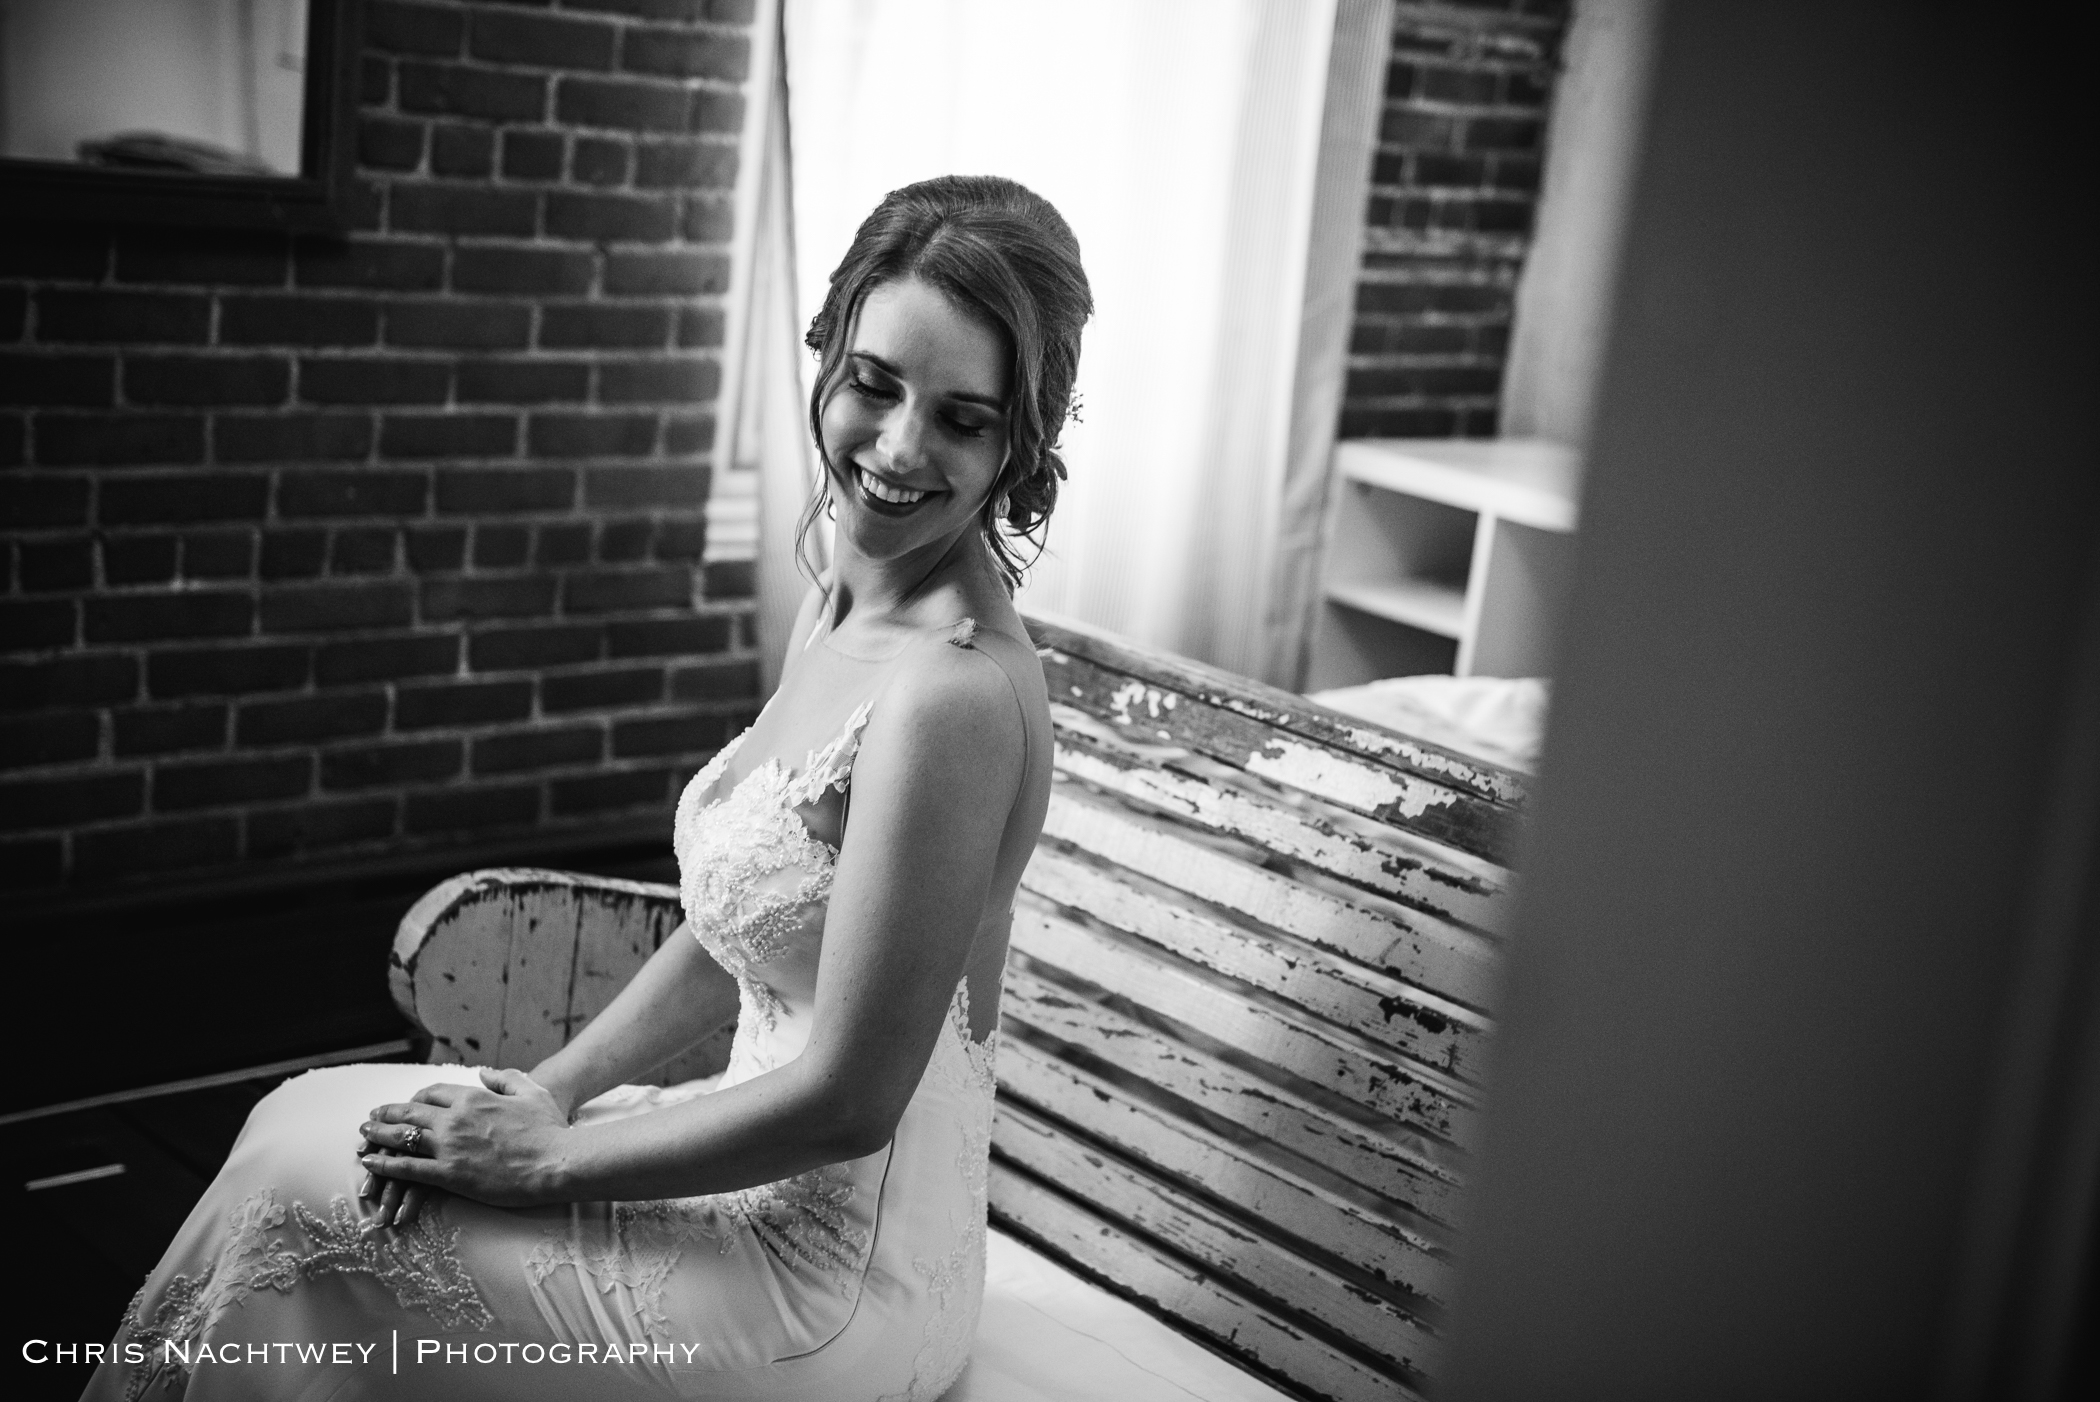 artistic-ct-wedding-photographers-chris-nachtwey-2017-100.jpg